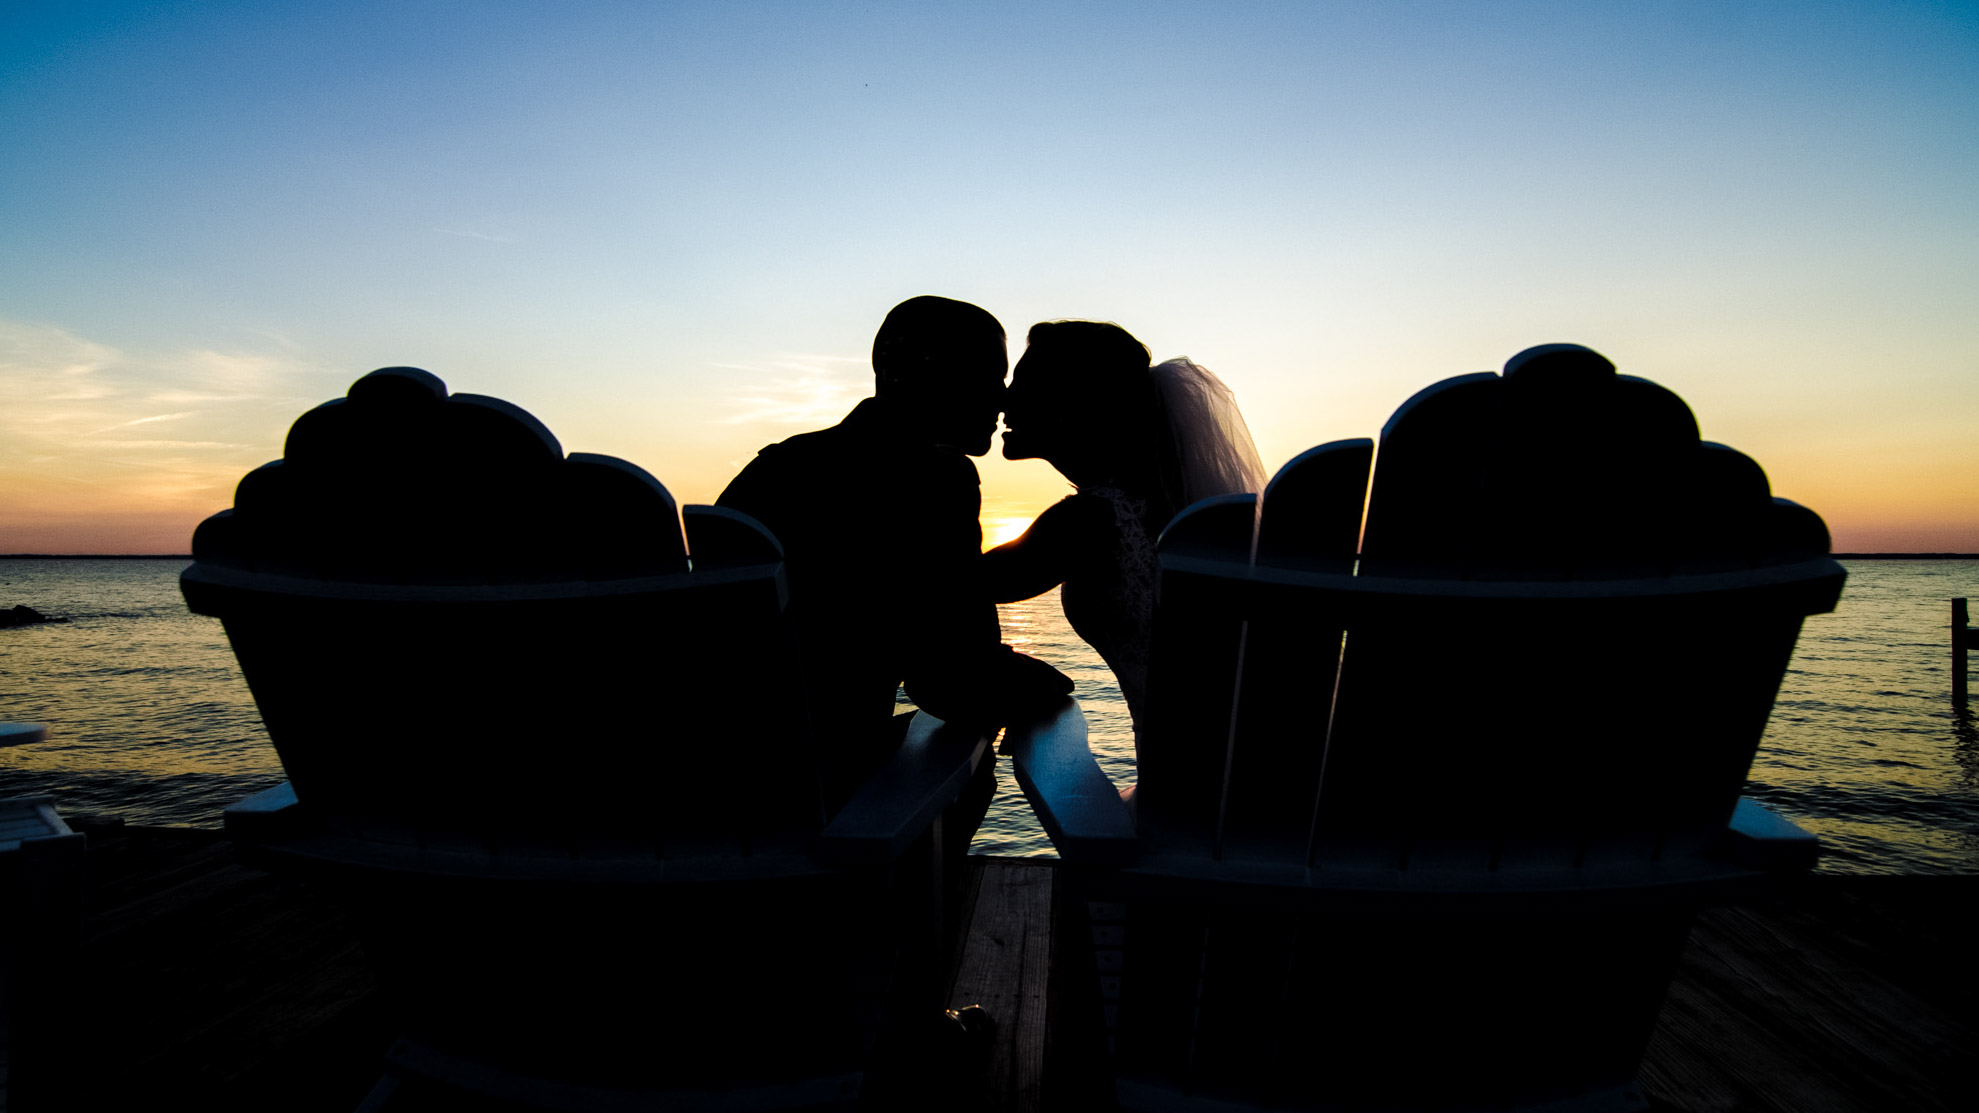 dc+metro+wedding+photographer+vadym+guliuk+photography+wedding+bride+and+groom-2031.jpg